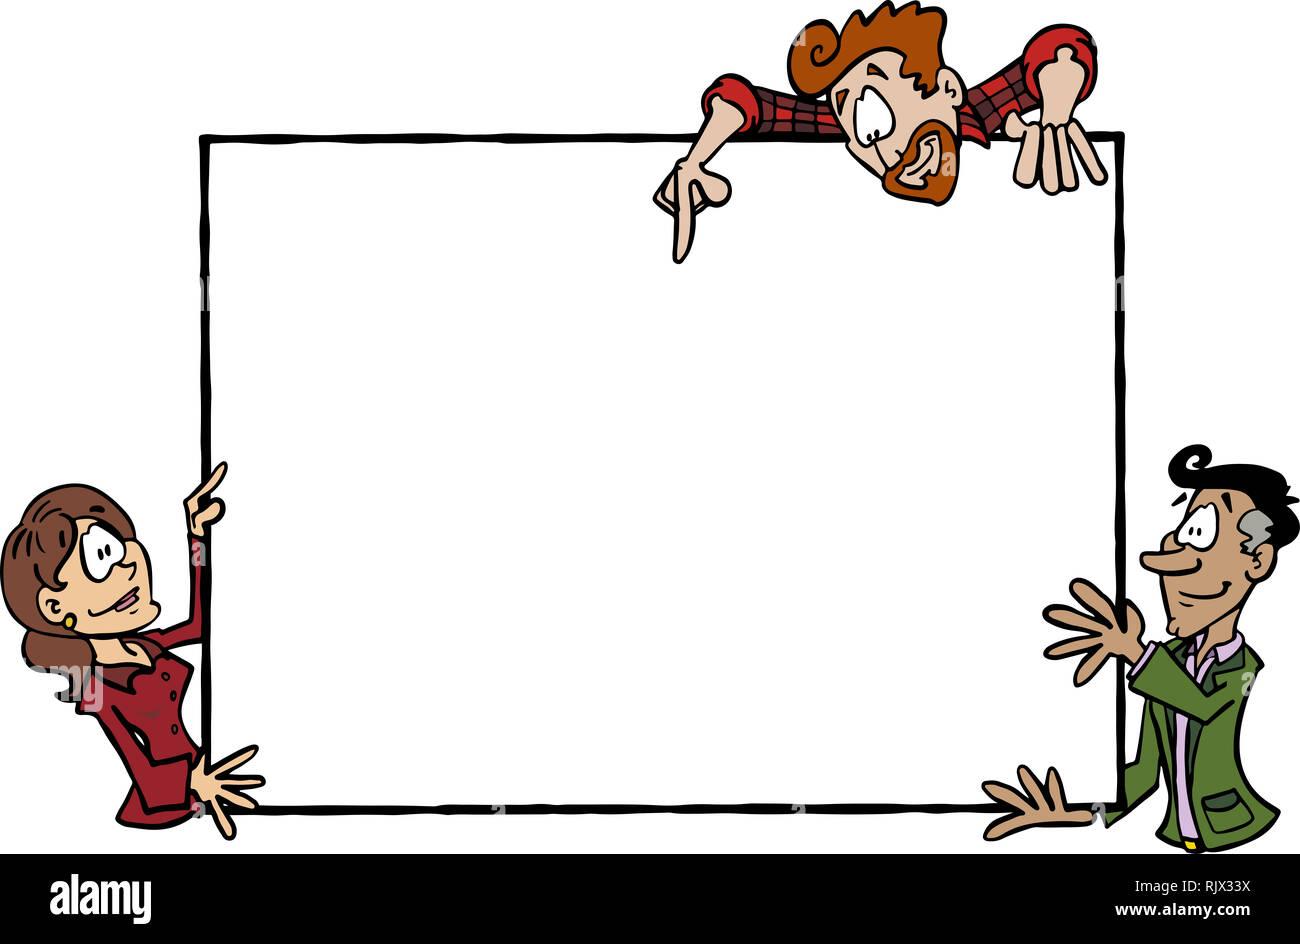 Empty billboard held by three cartoon characters Sophie, Mark, Manuel - Stock Image